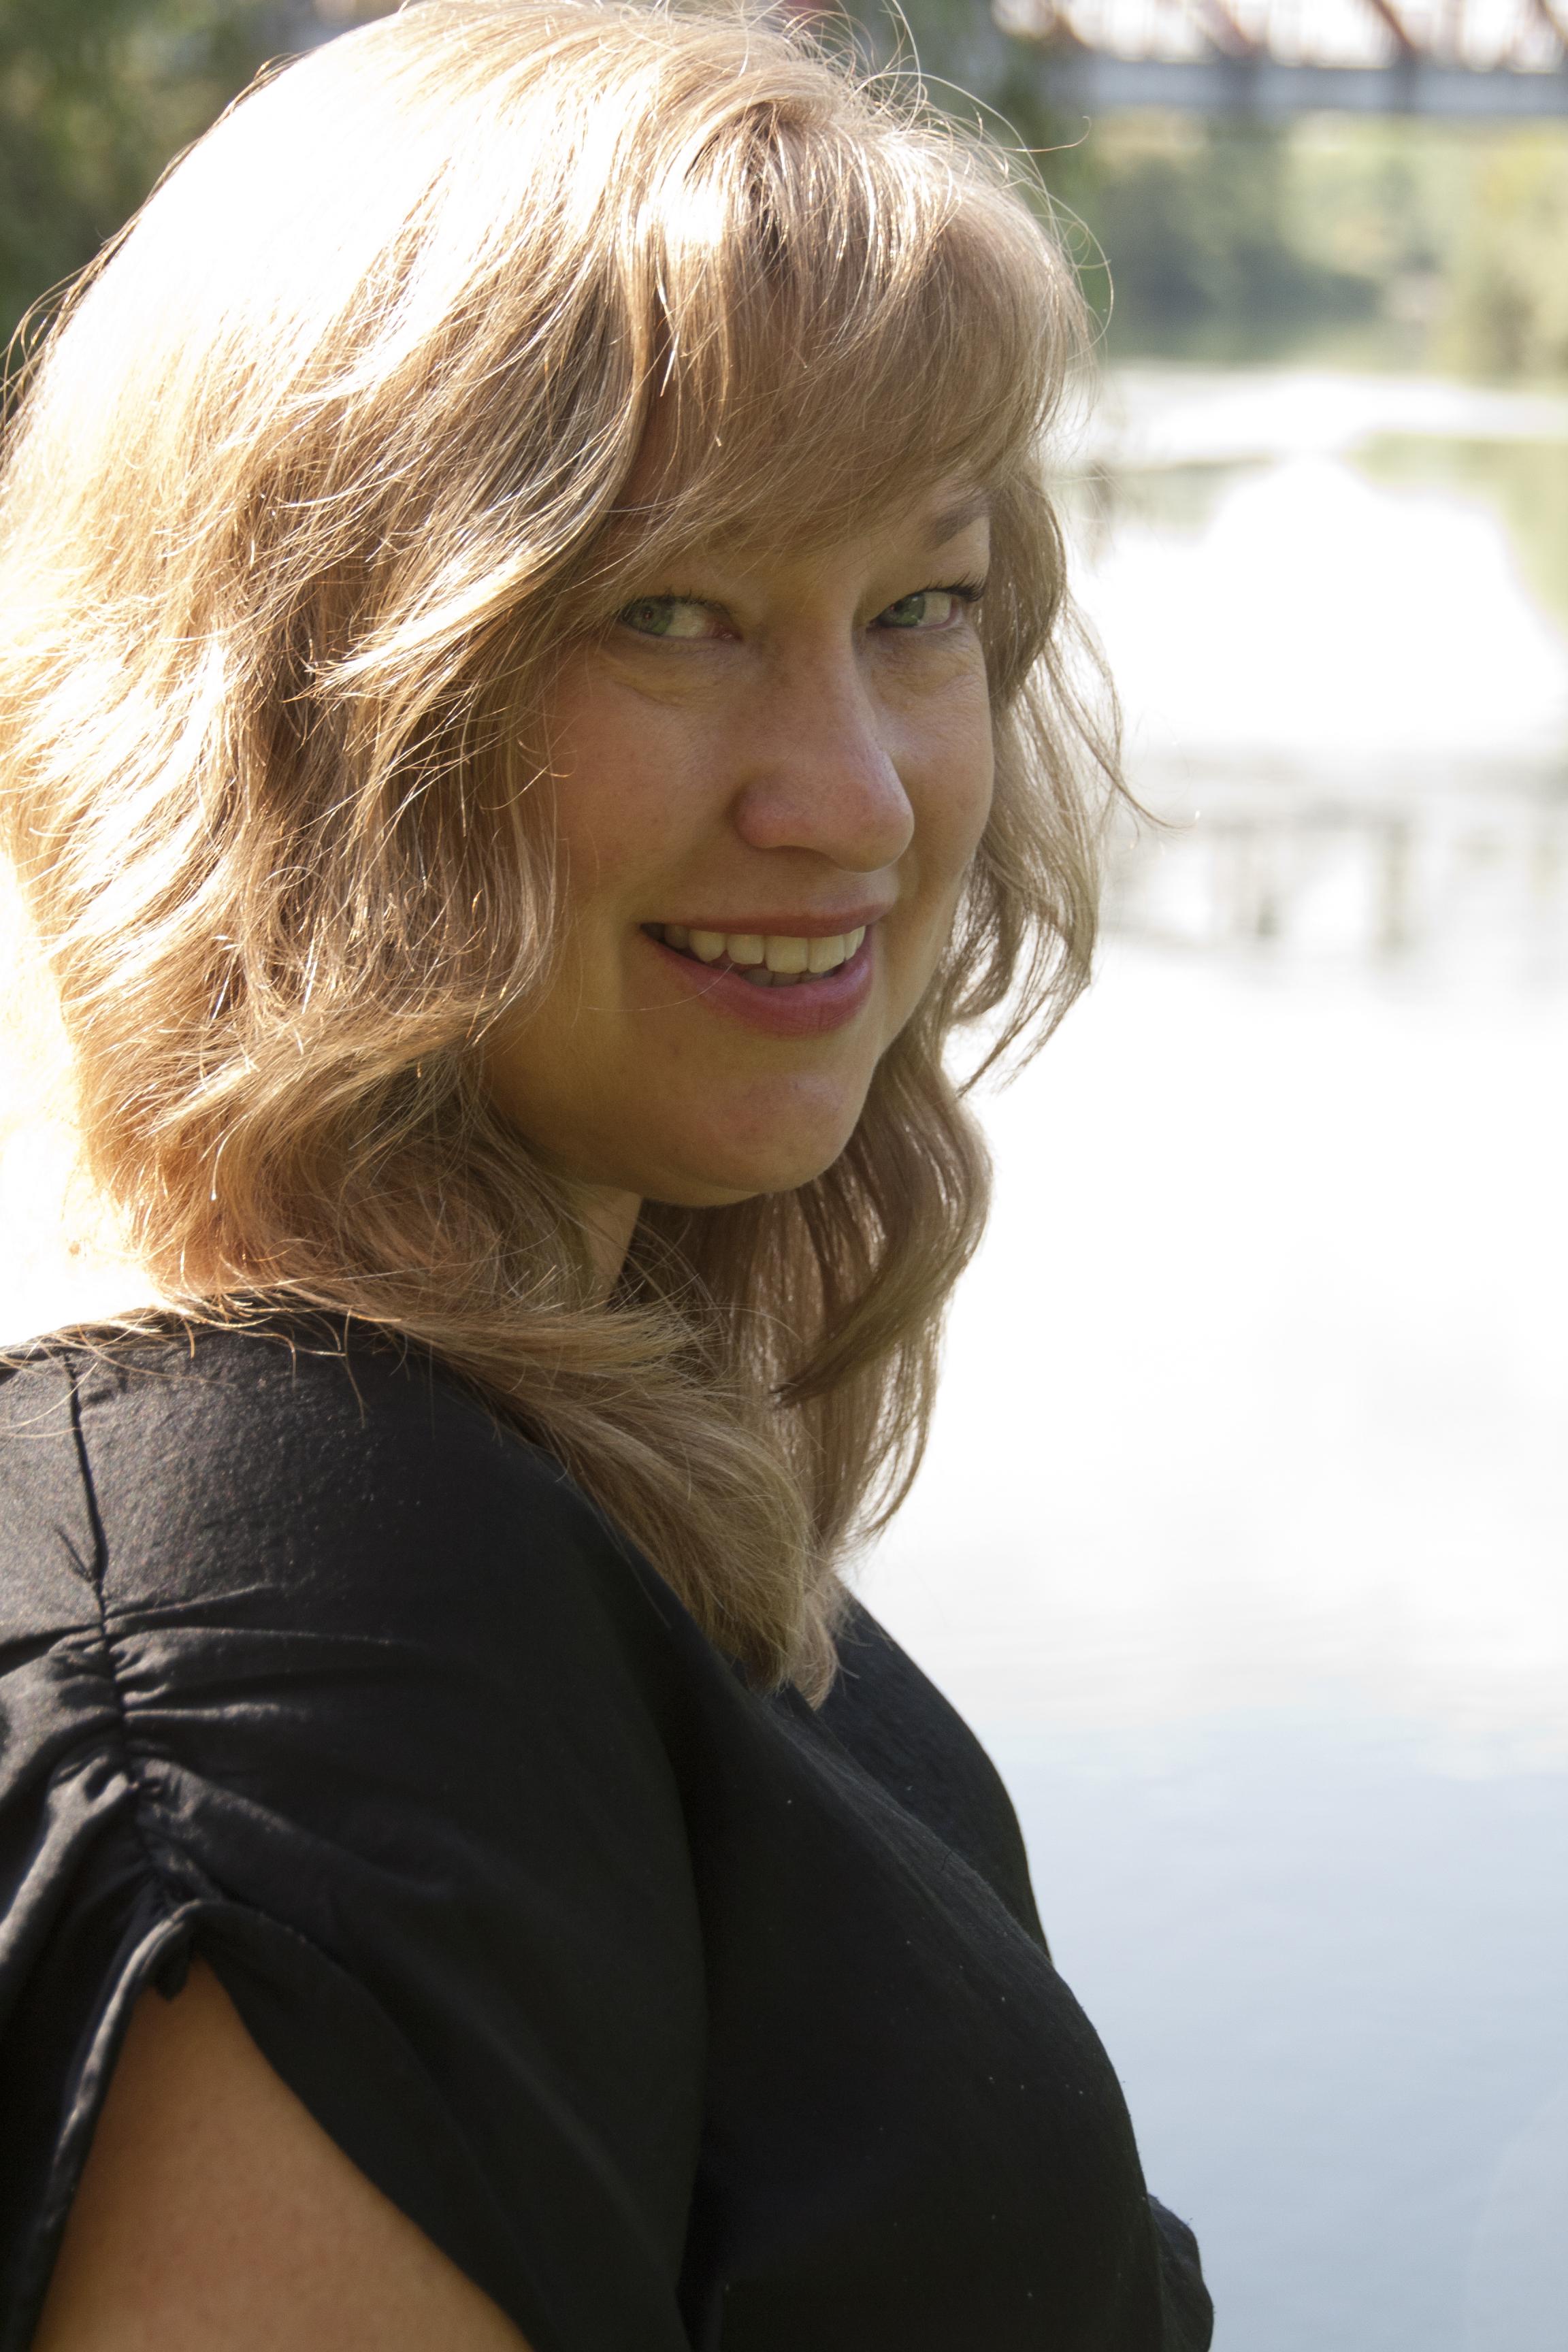 June Saraceno